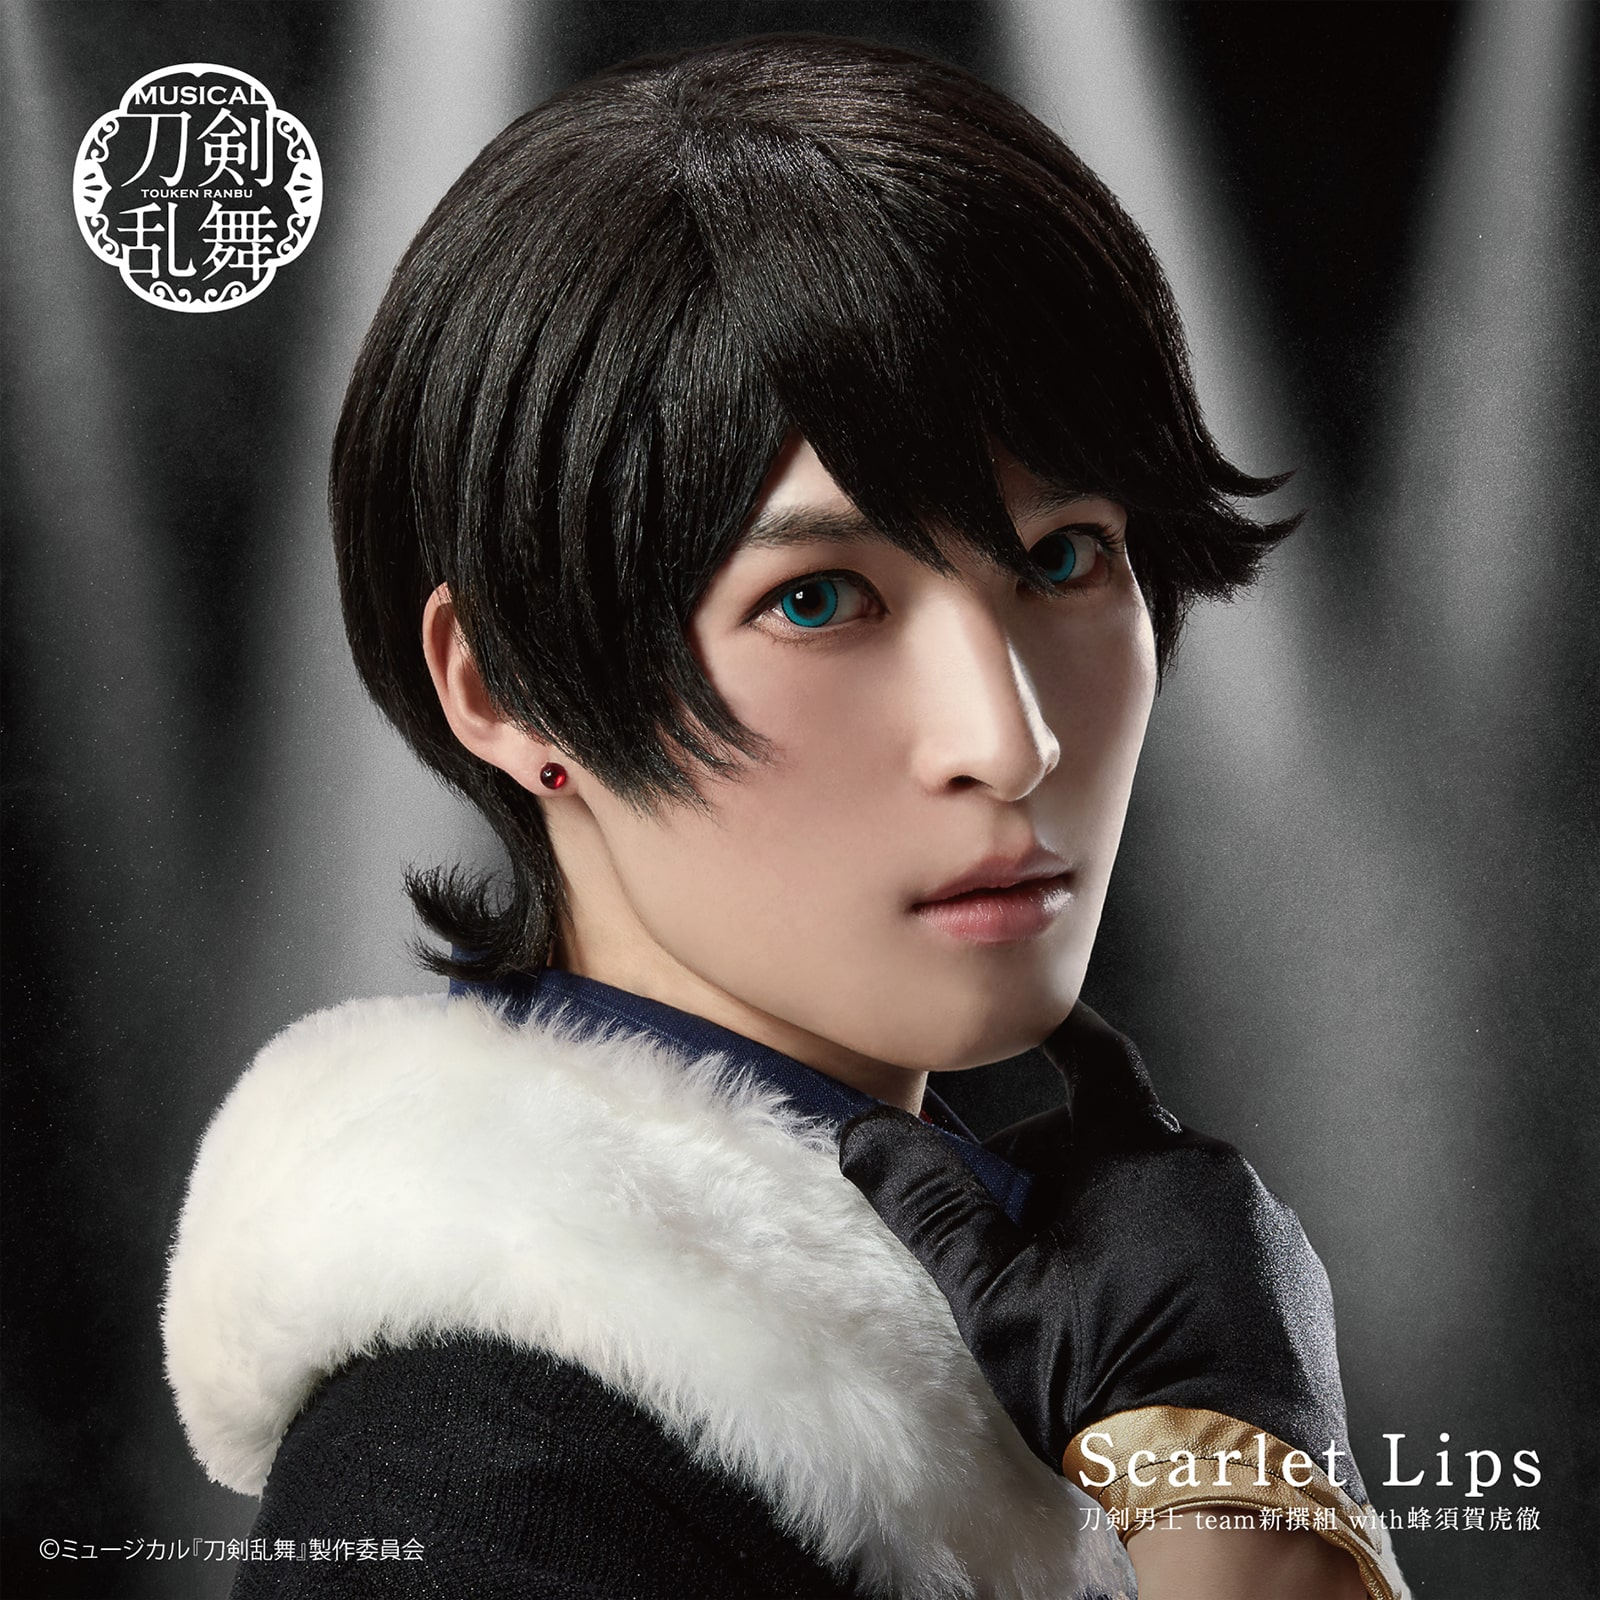 『Scarlet Lips』刀剣男士 team新撰組 with蜂須賀虎徹